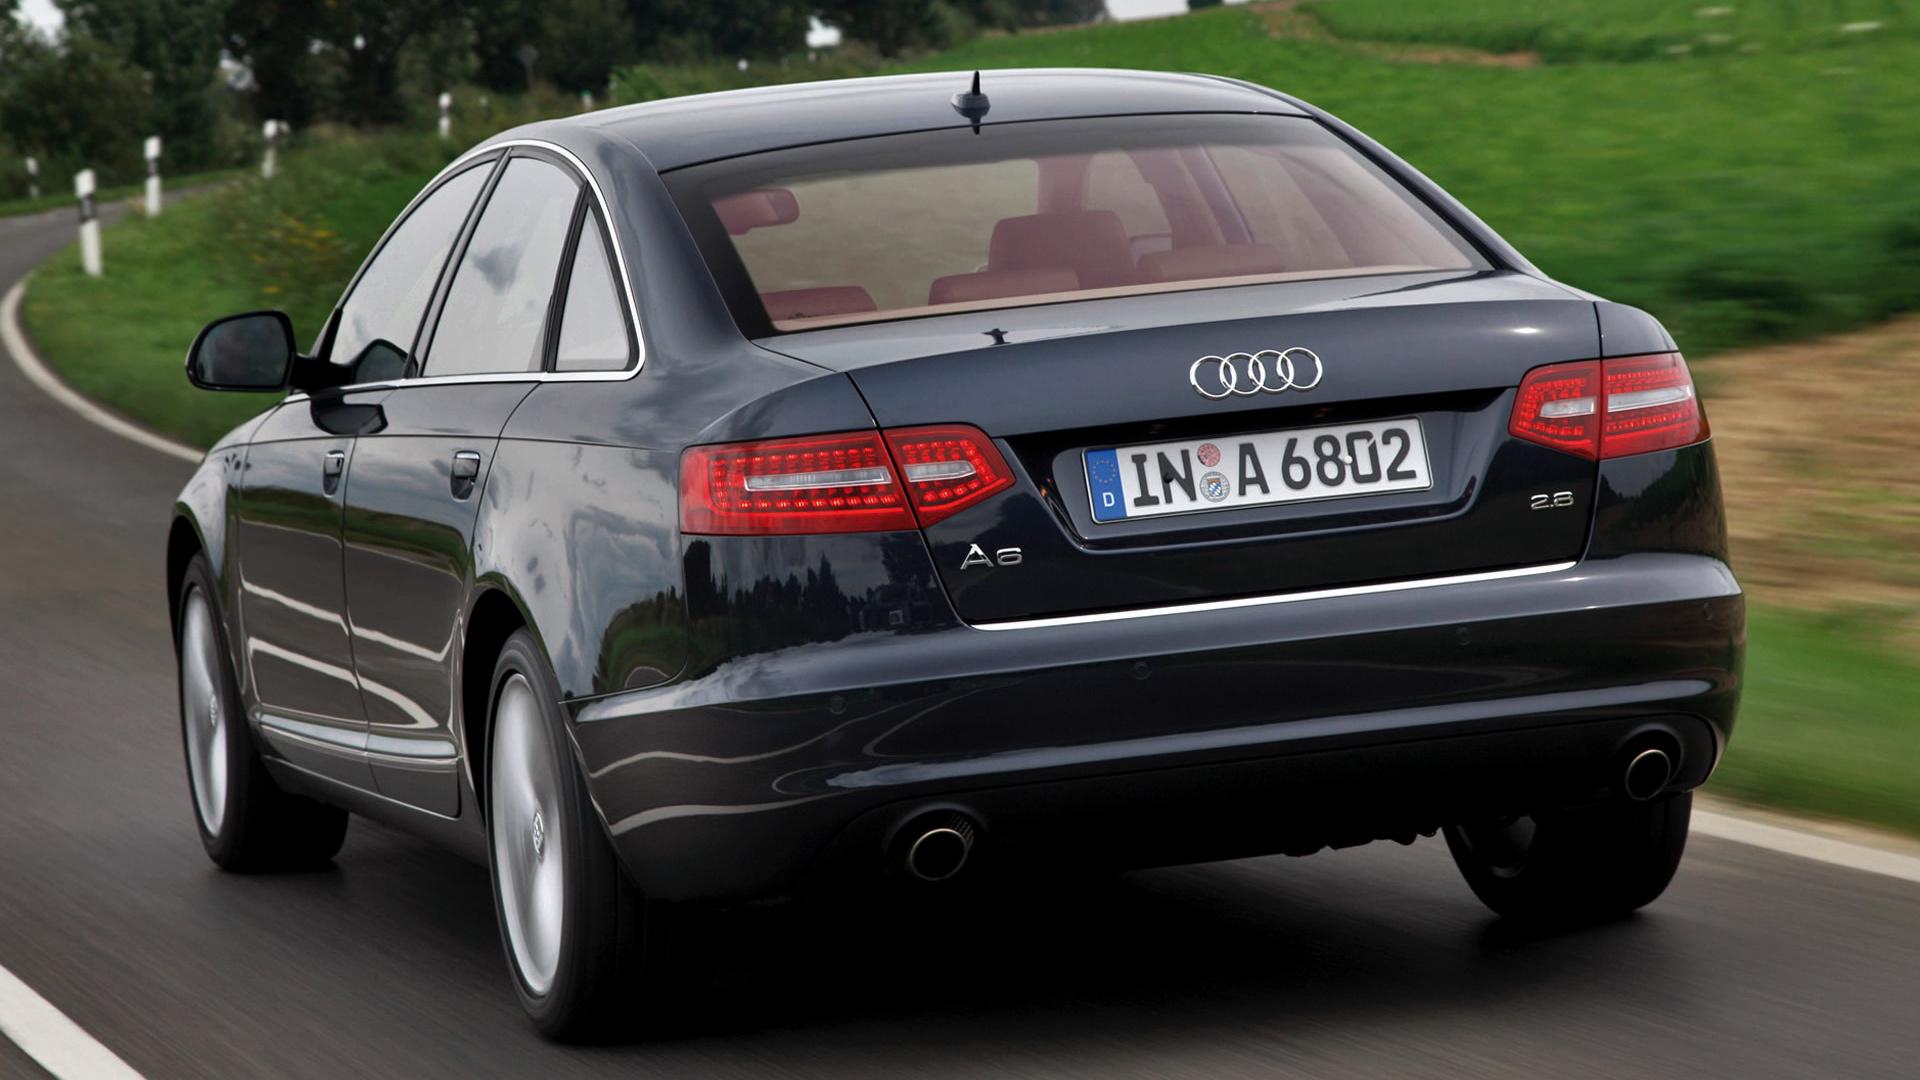 2008 Audi A6 Sedan Wallpapers And Hd Images Car Pixel